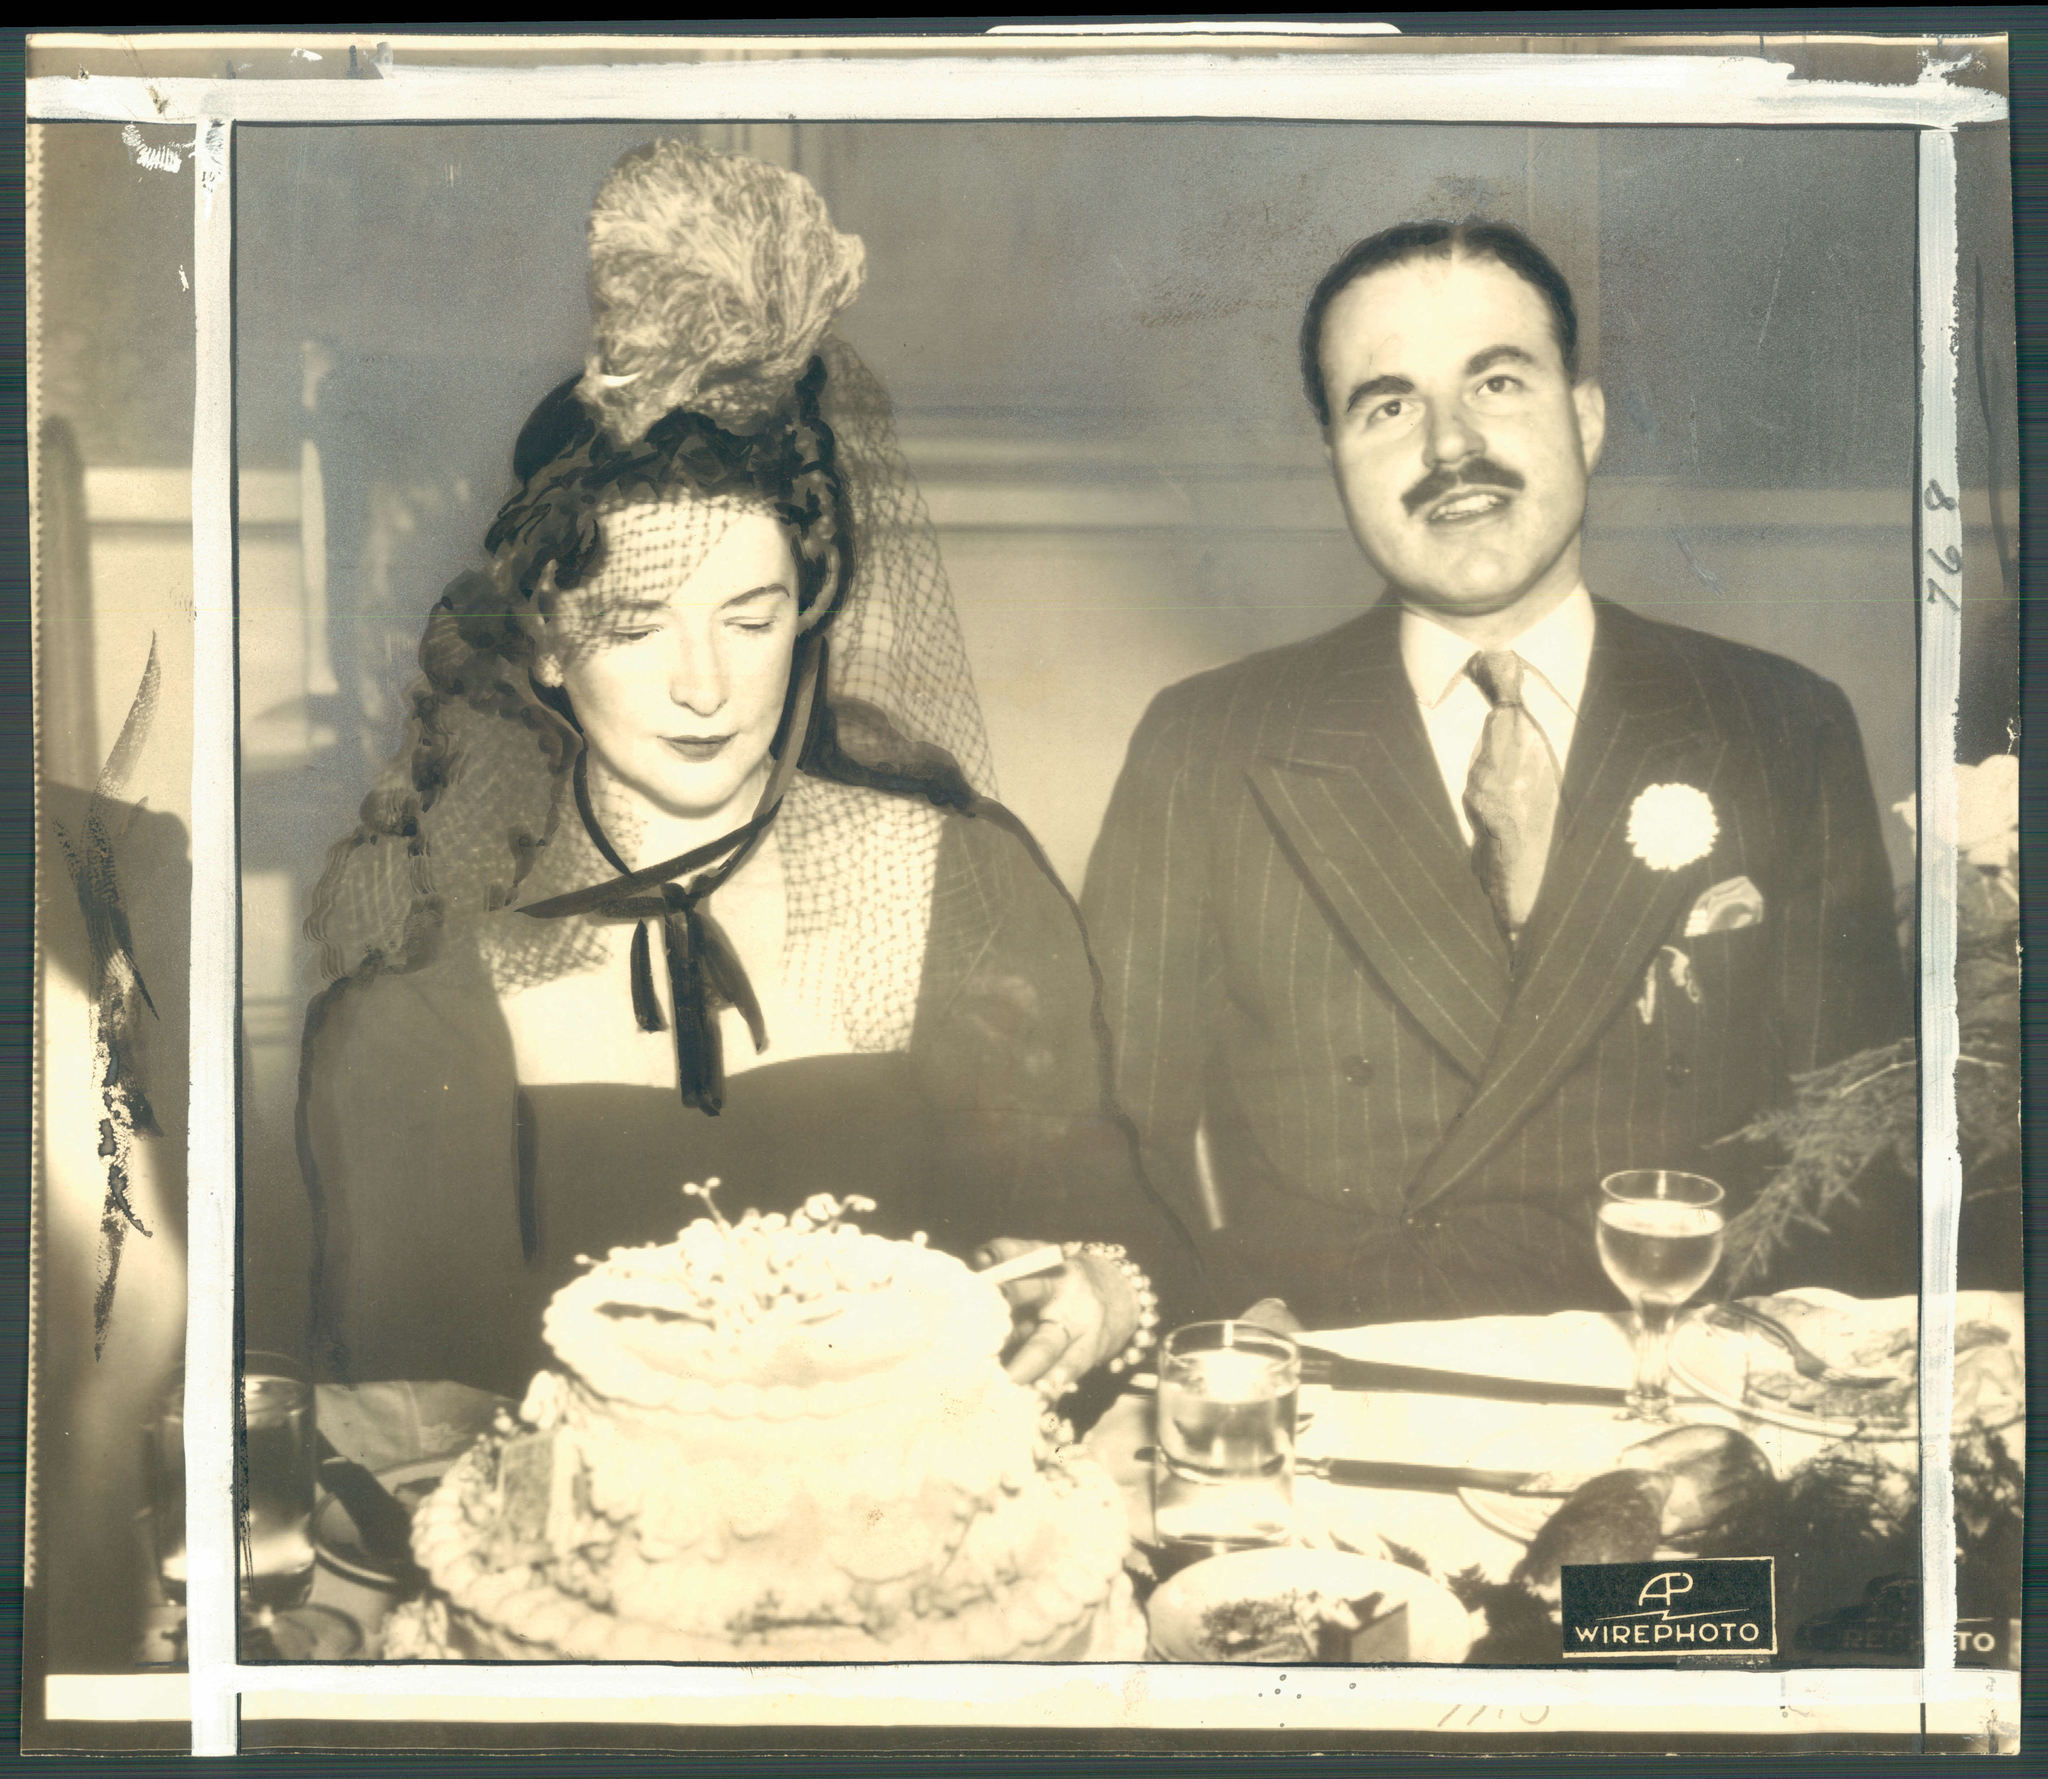 st valentines day massacre story - Retro Baltimore Ernest Simpson the man Wallis left for a